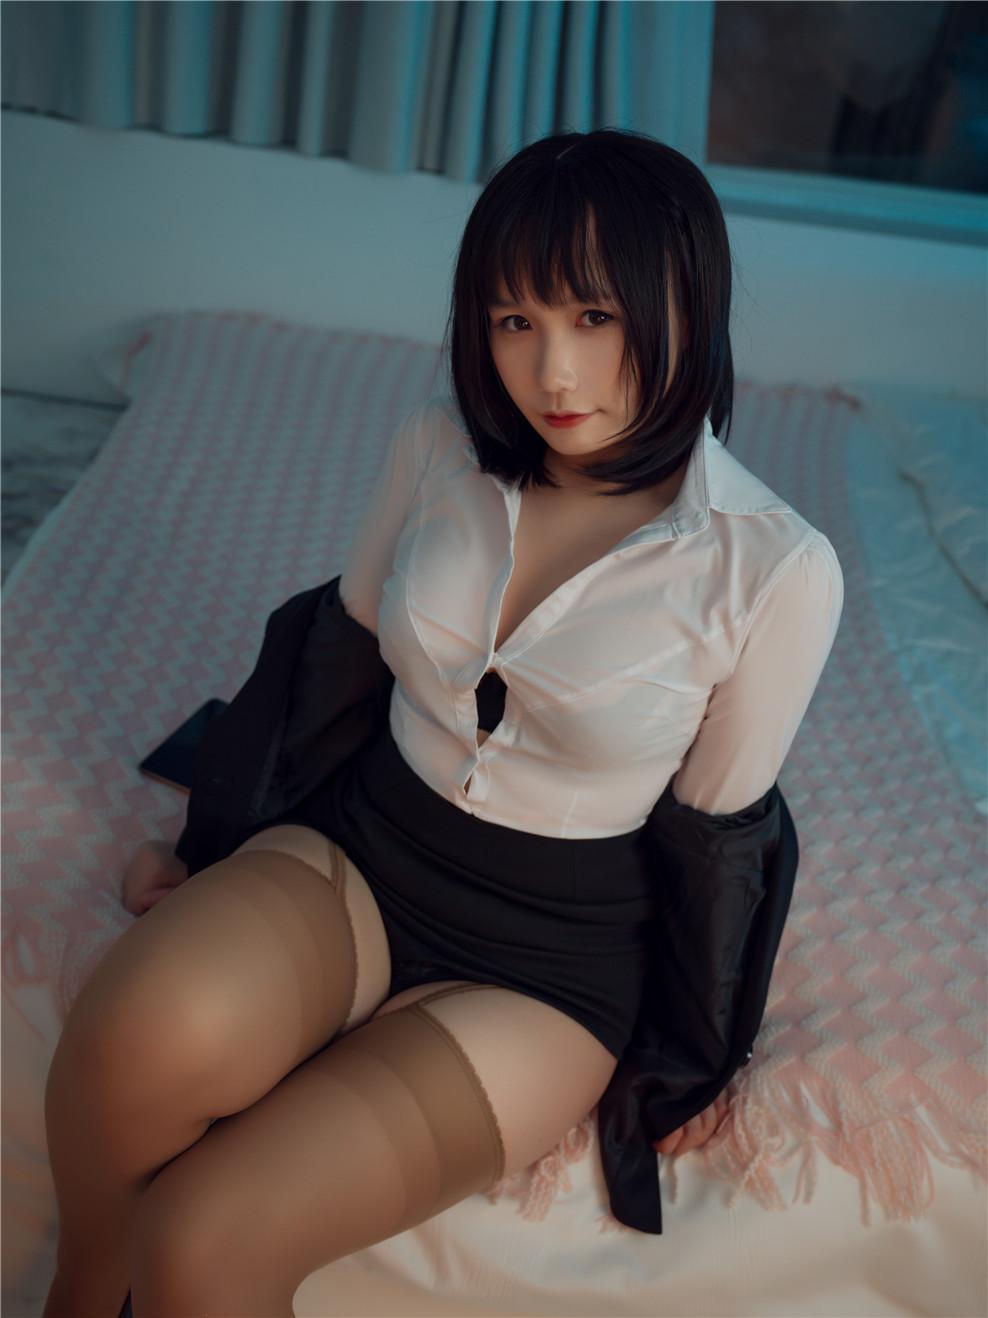 麻花酱 NO.030 秘书[20P-178MB]